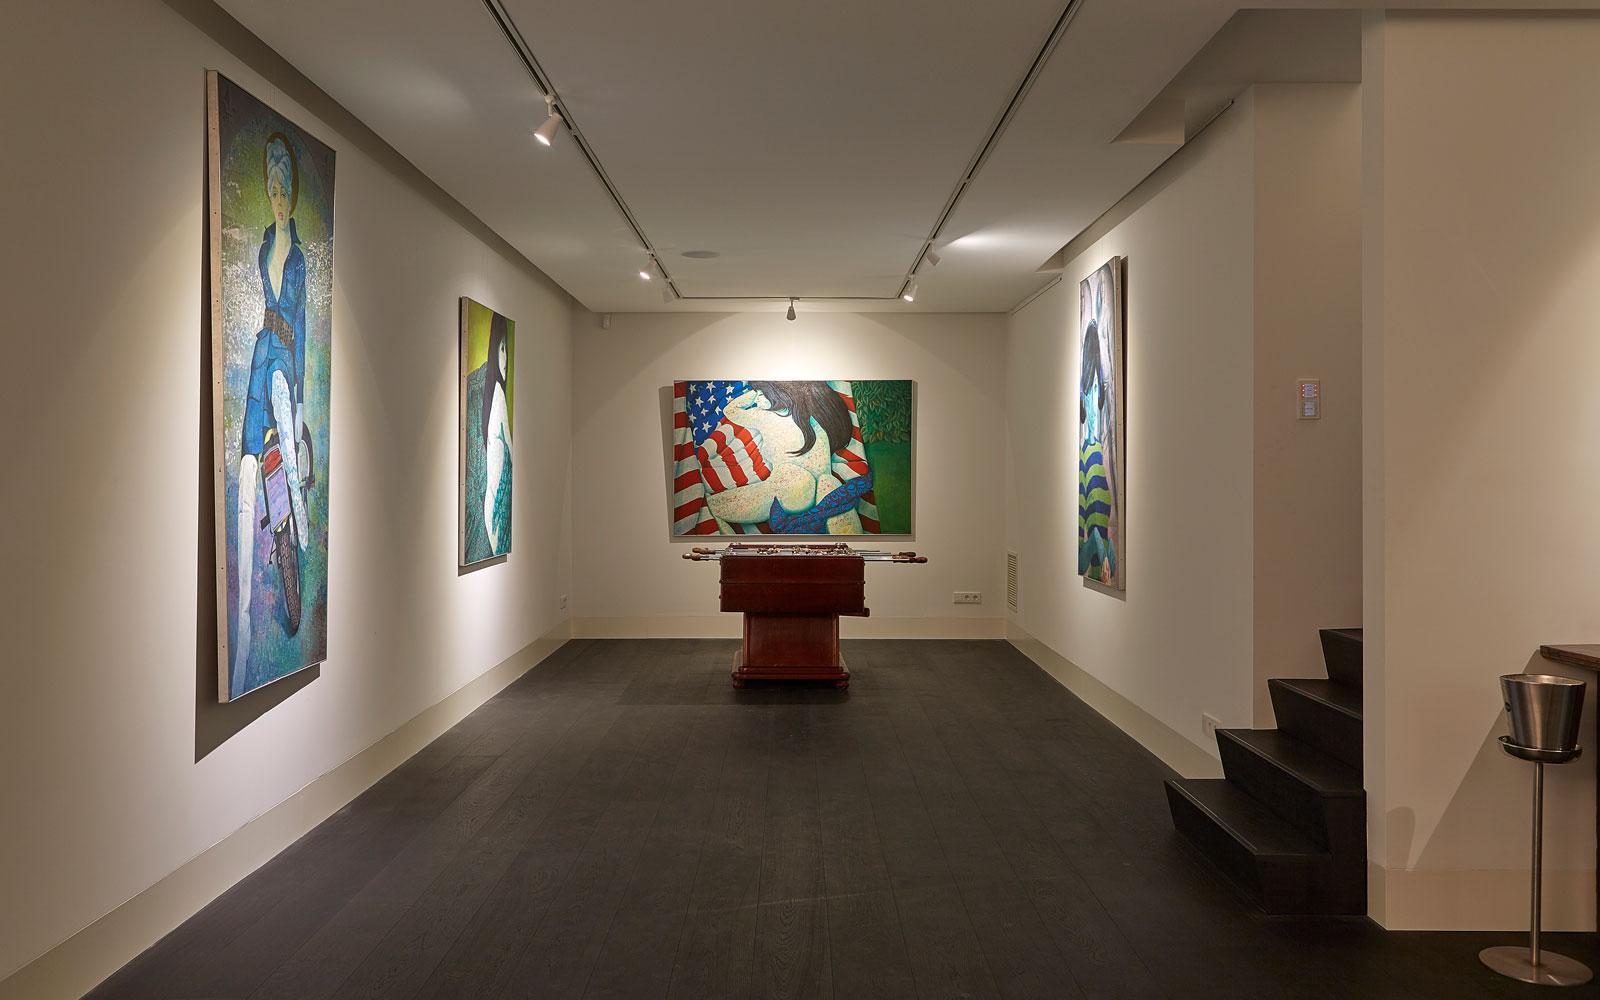 Kelder, galerie, kunst, schilderijen, symmetrische villa, PBV Architects